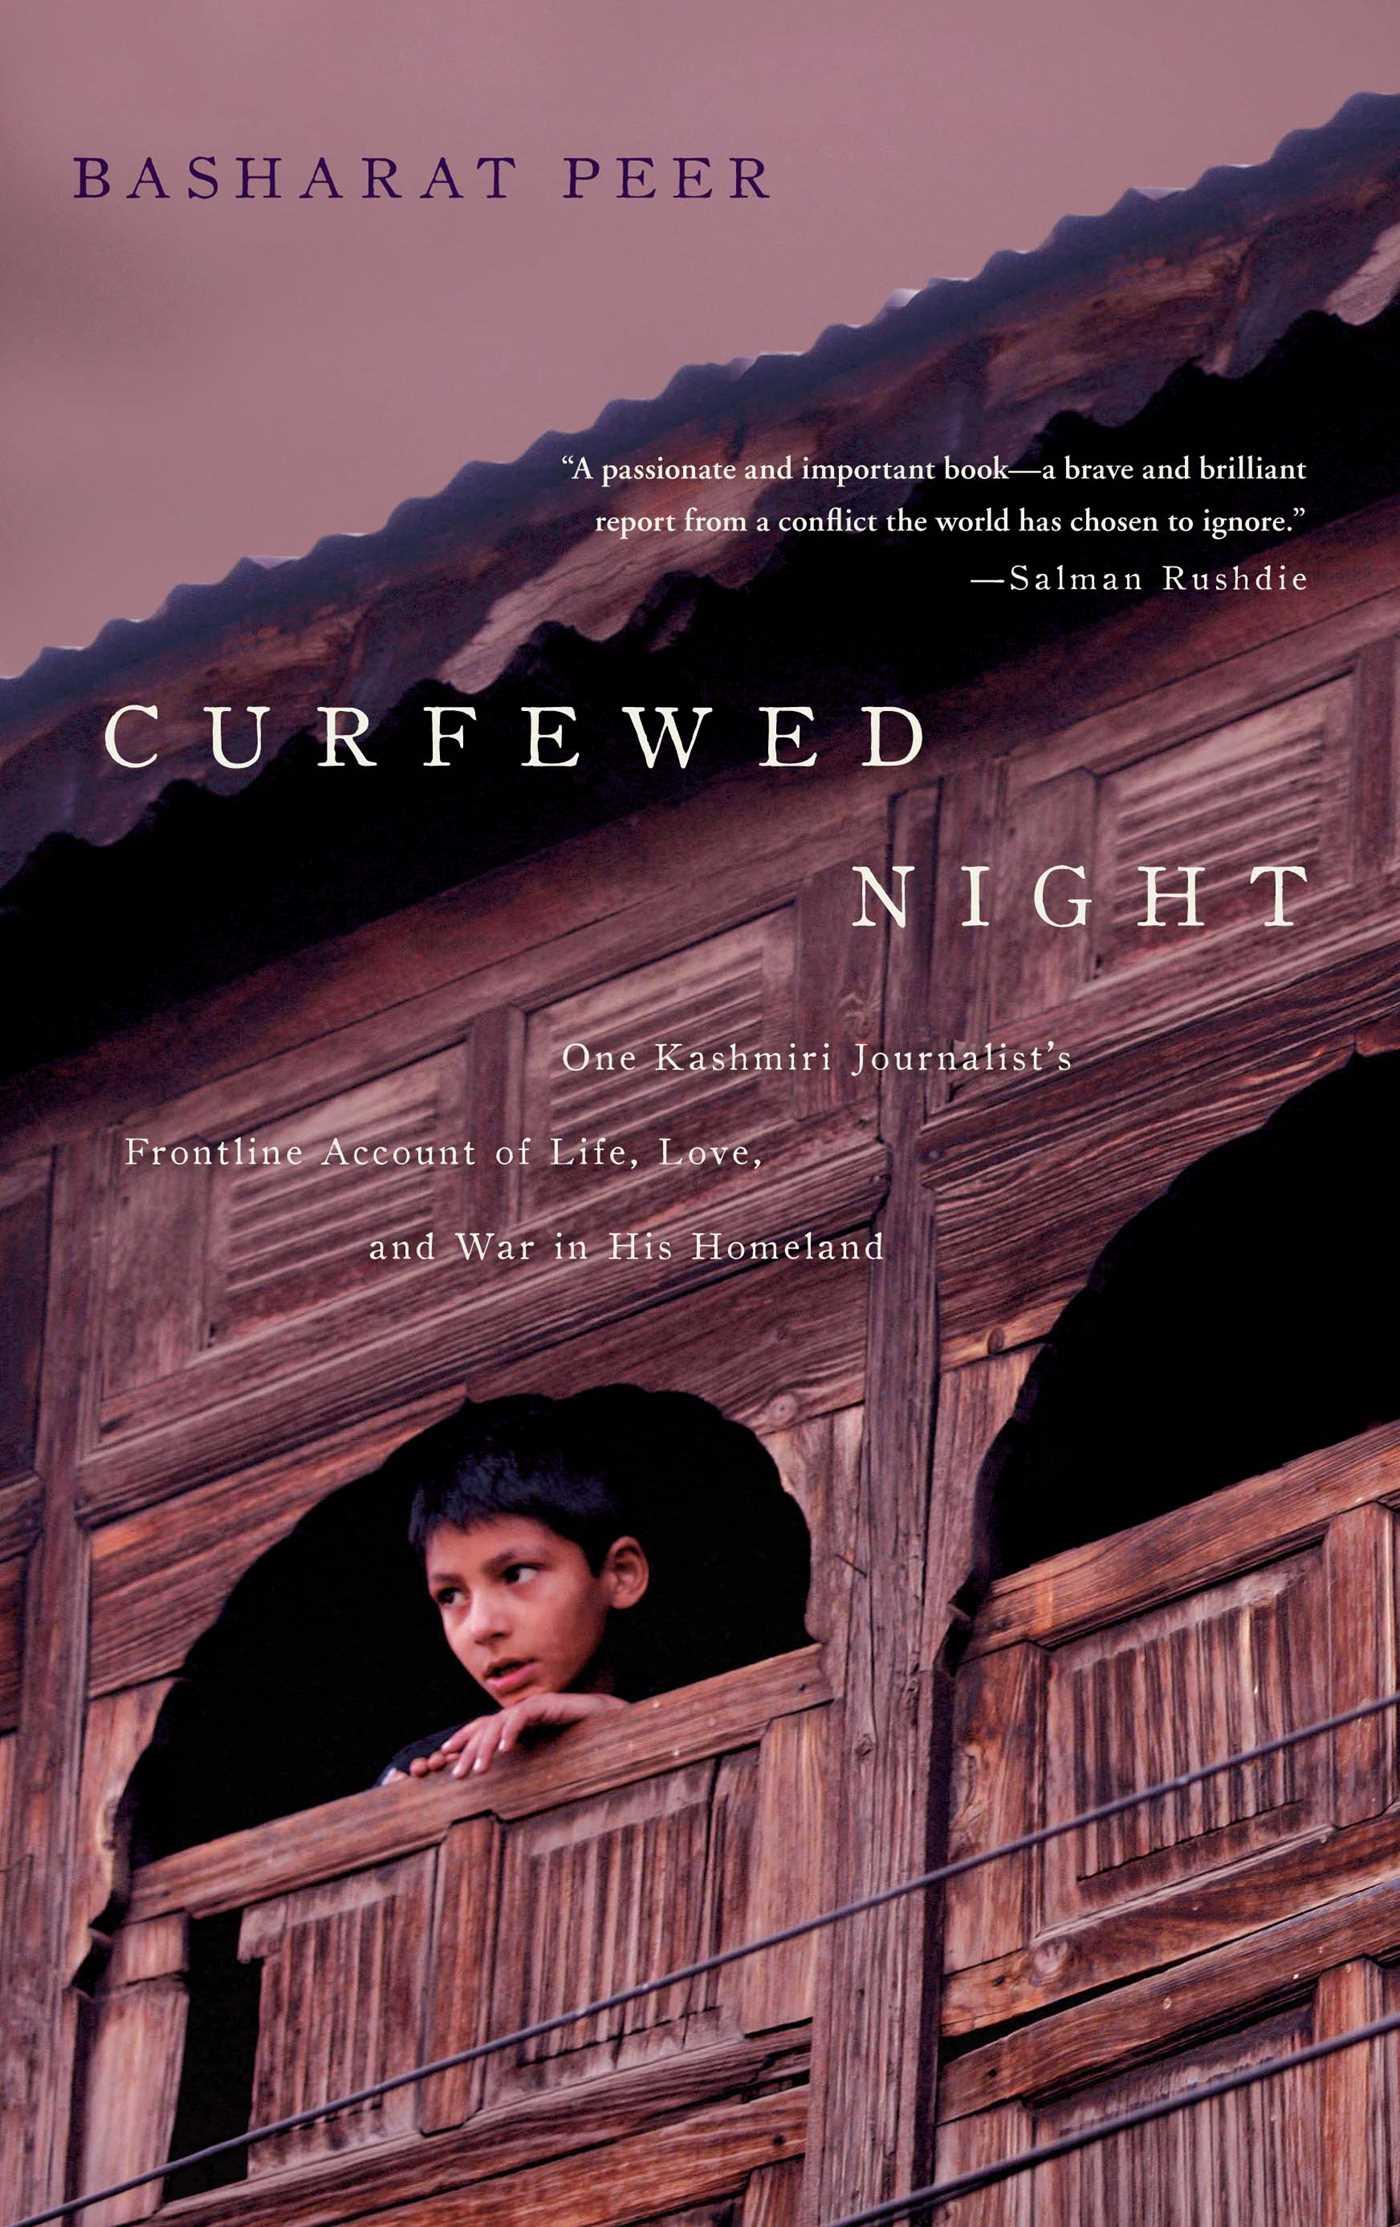 Read ebook curfewed night pdf file.